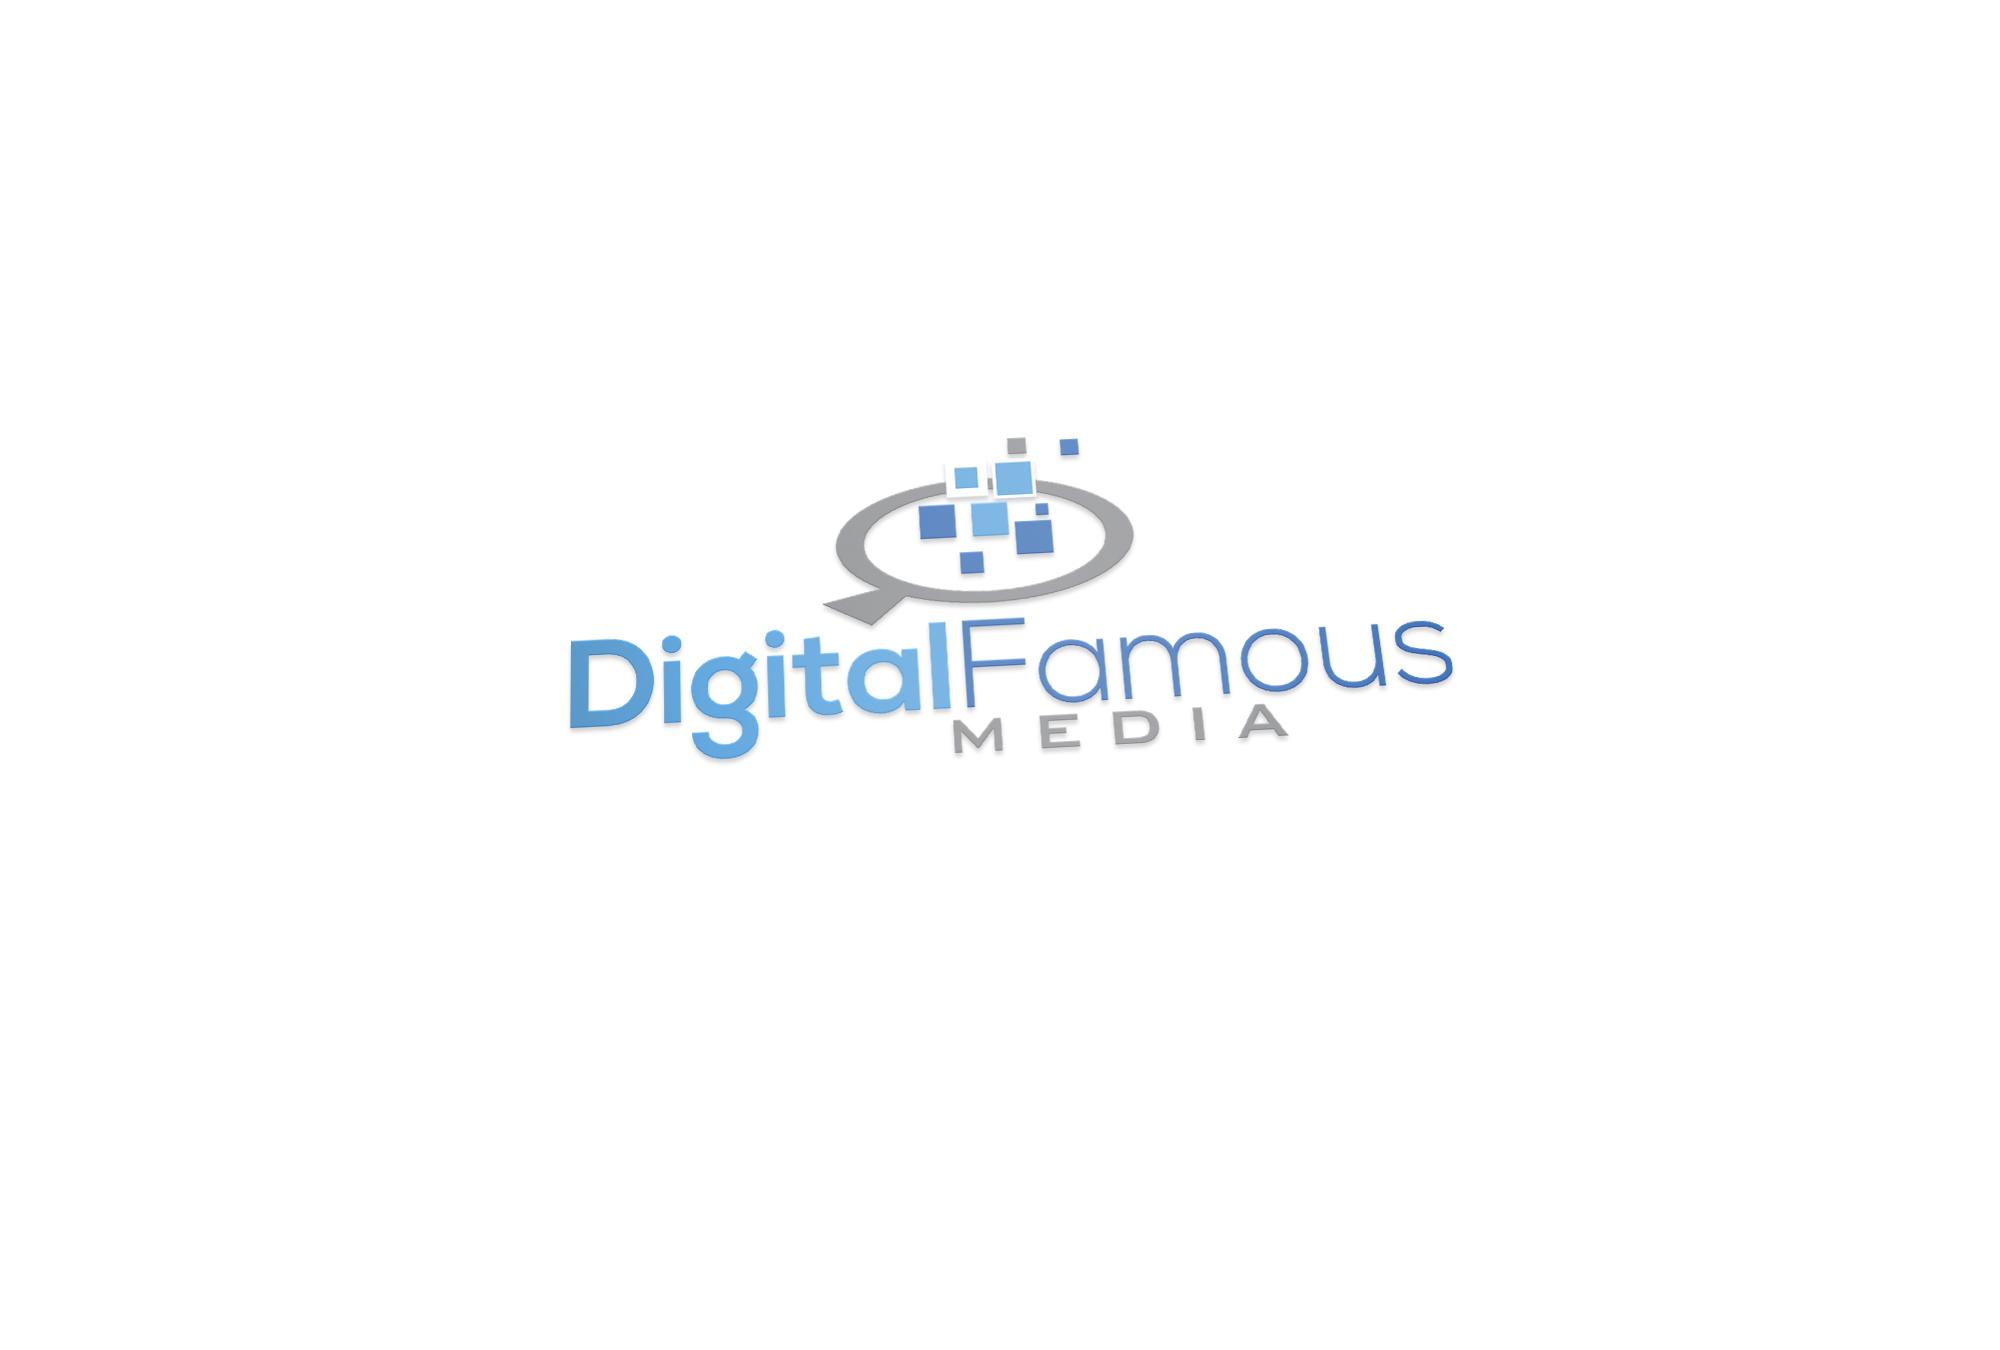 Digital Famous Media